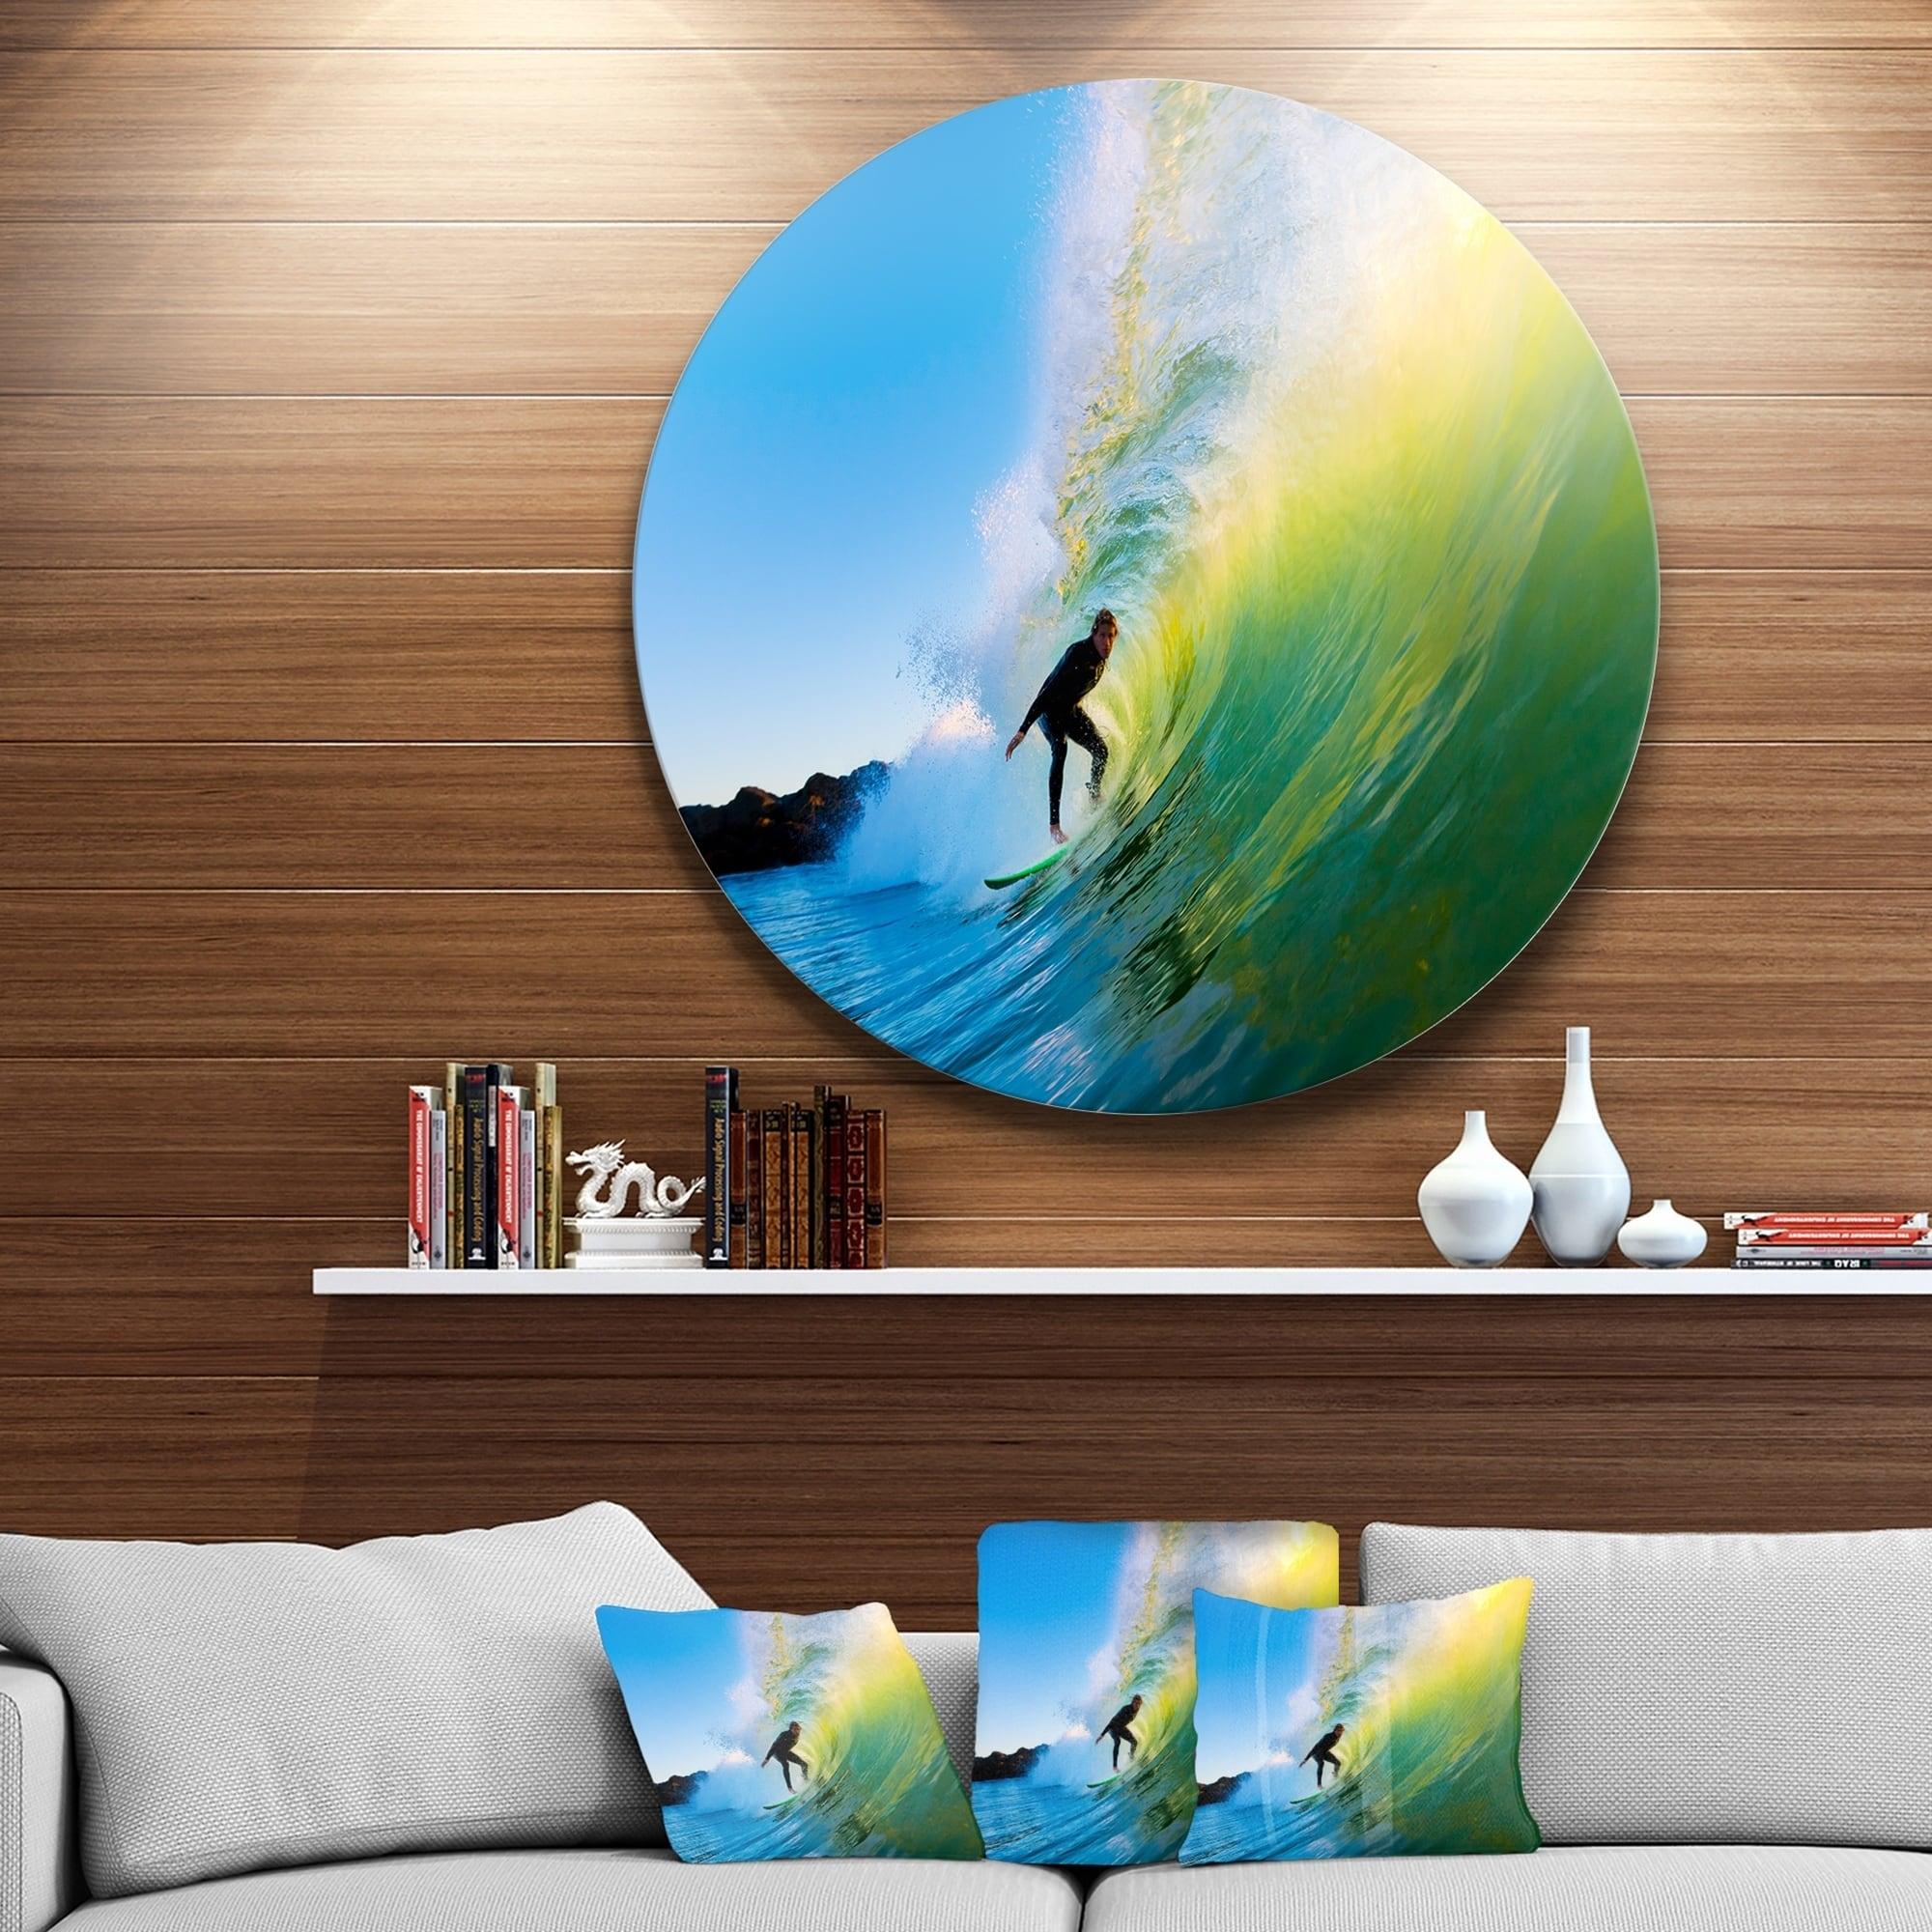 Designart Surfer Beating Green Waves Photo Disc Metal Artwork Overstock 14264996